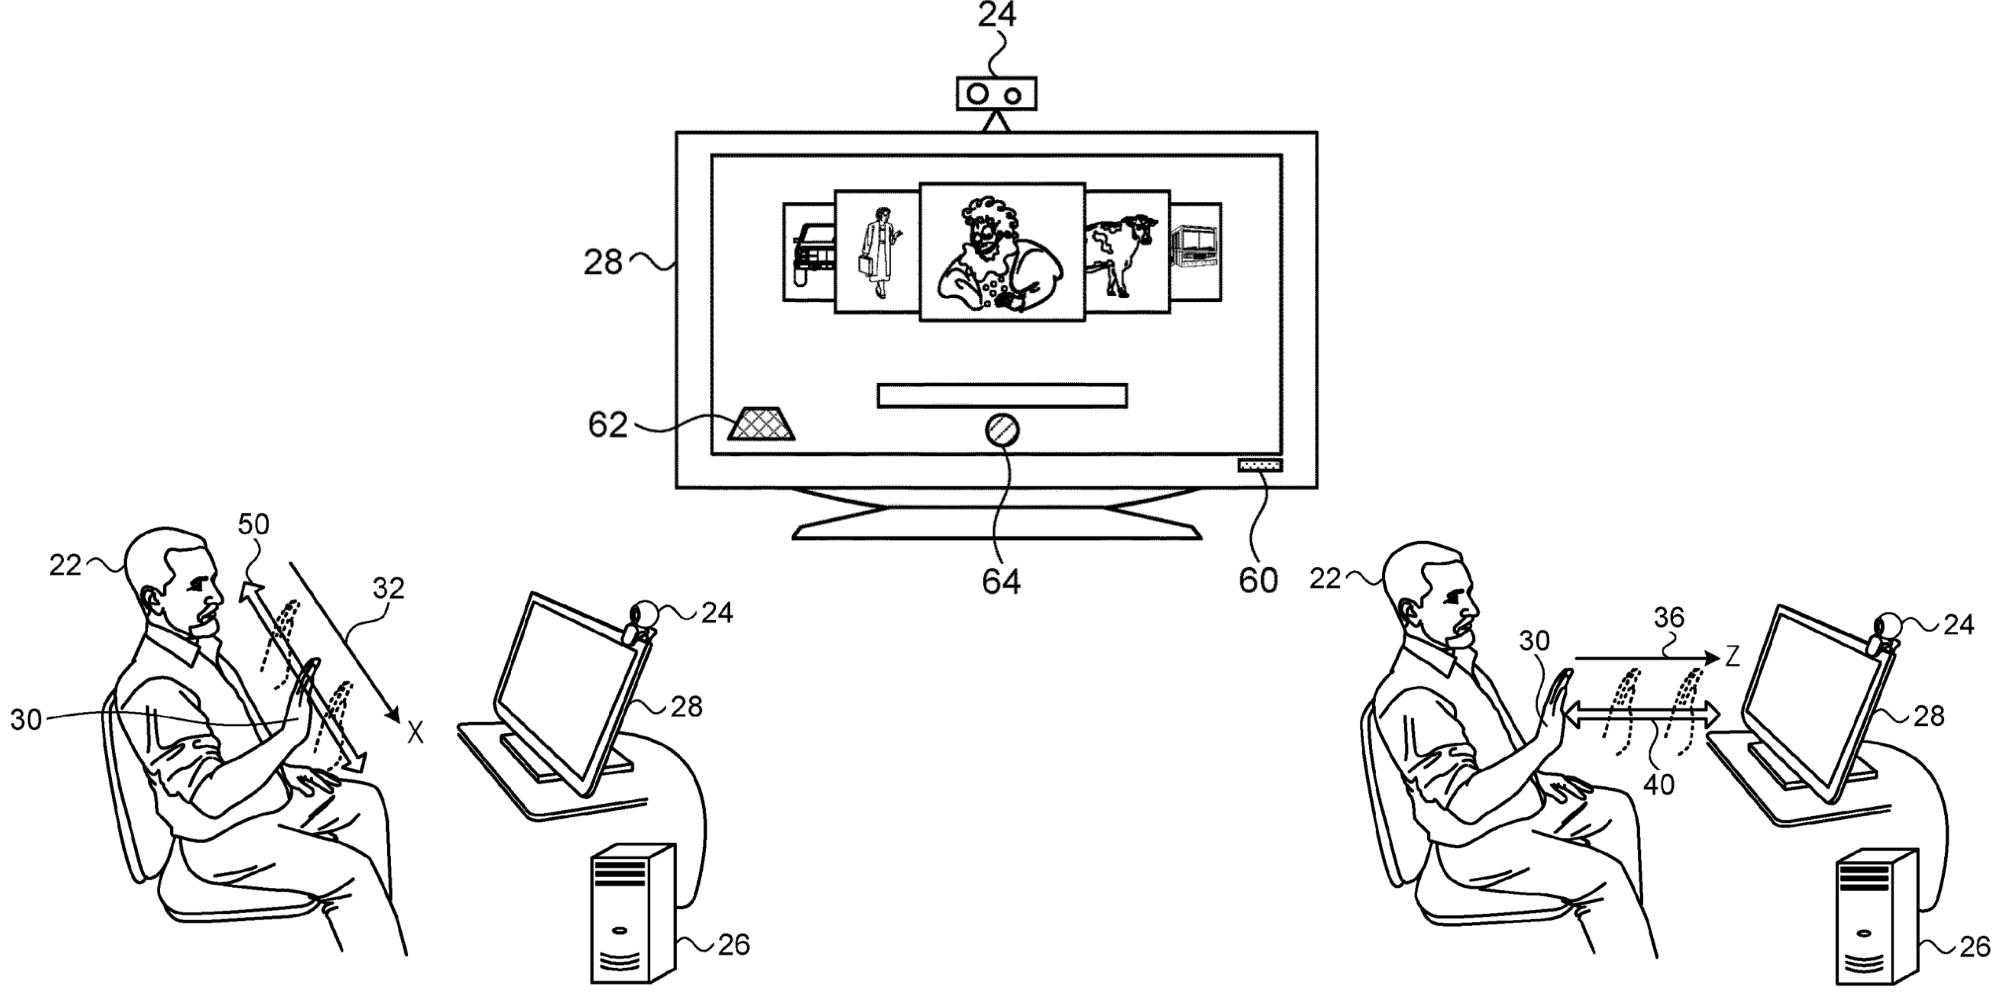 Apple Patents Mac Ui Based On Hand Gestures